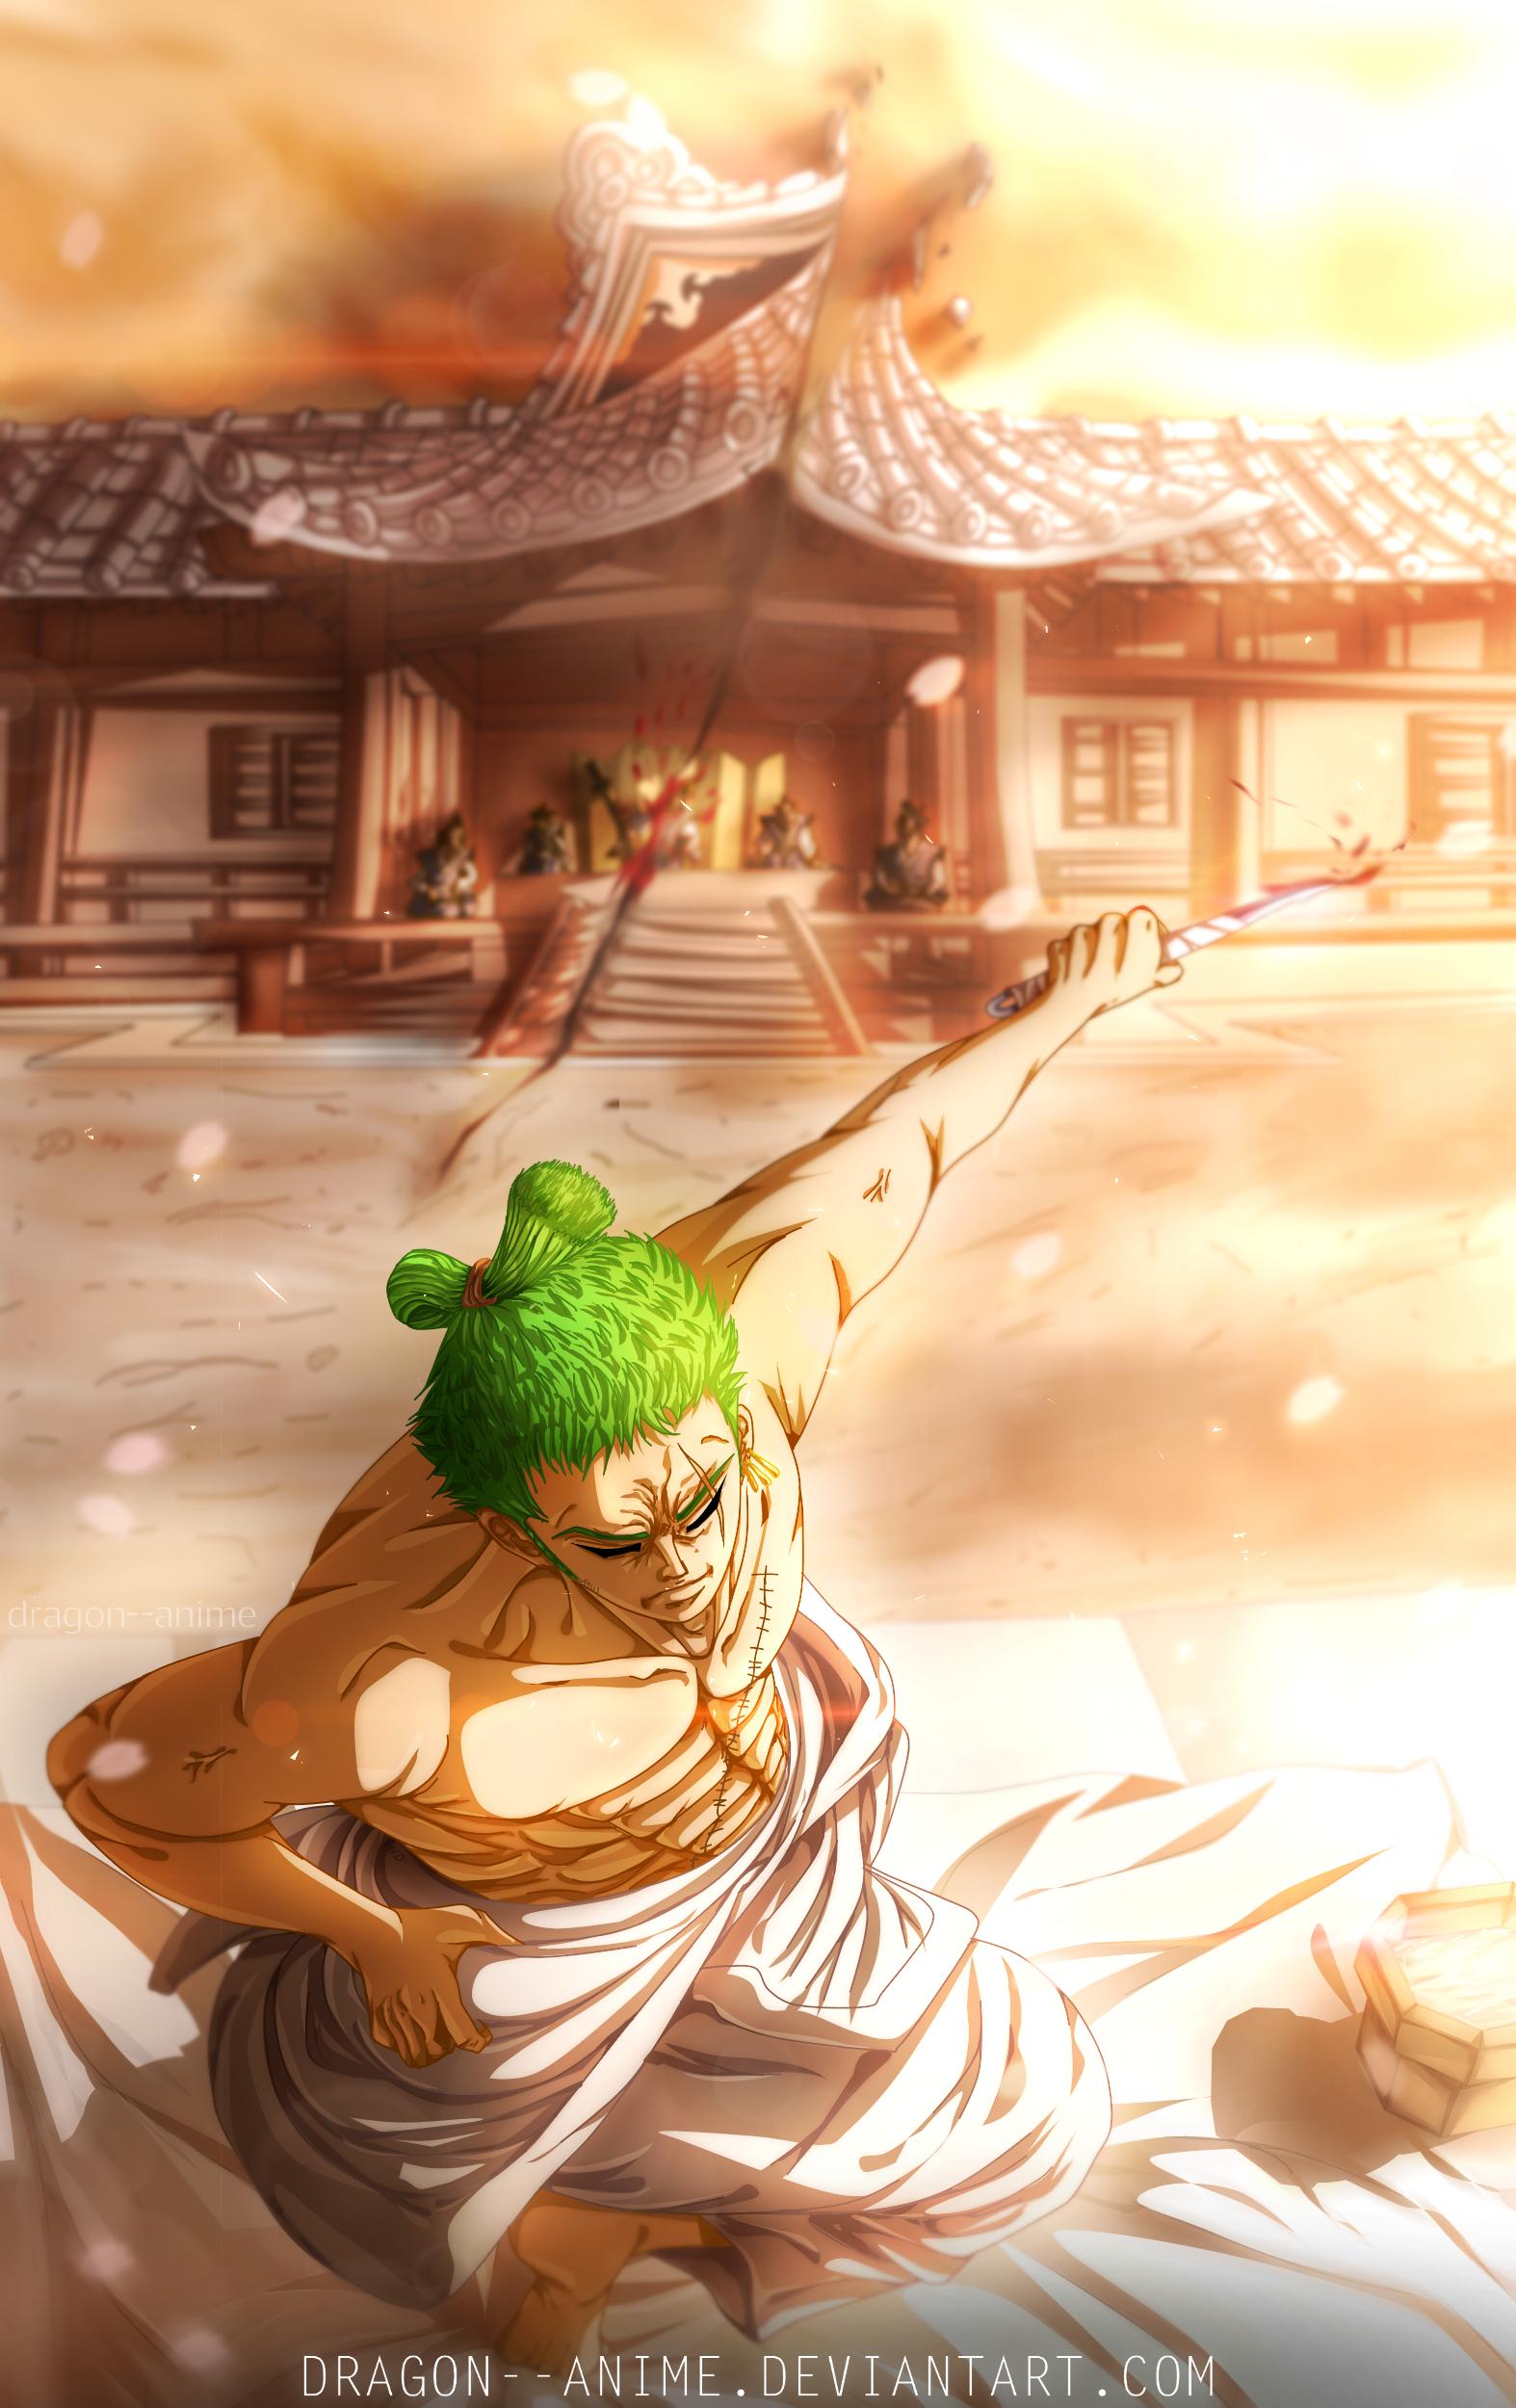 Wallpaper : Roronoa Zoro, One Piece 1574x2500 - brokenlink ...